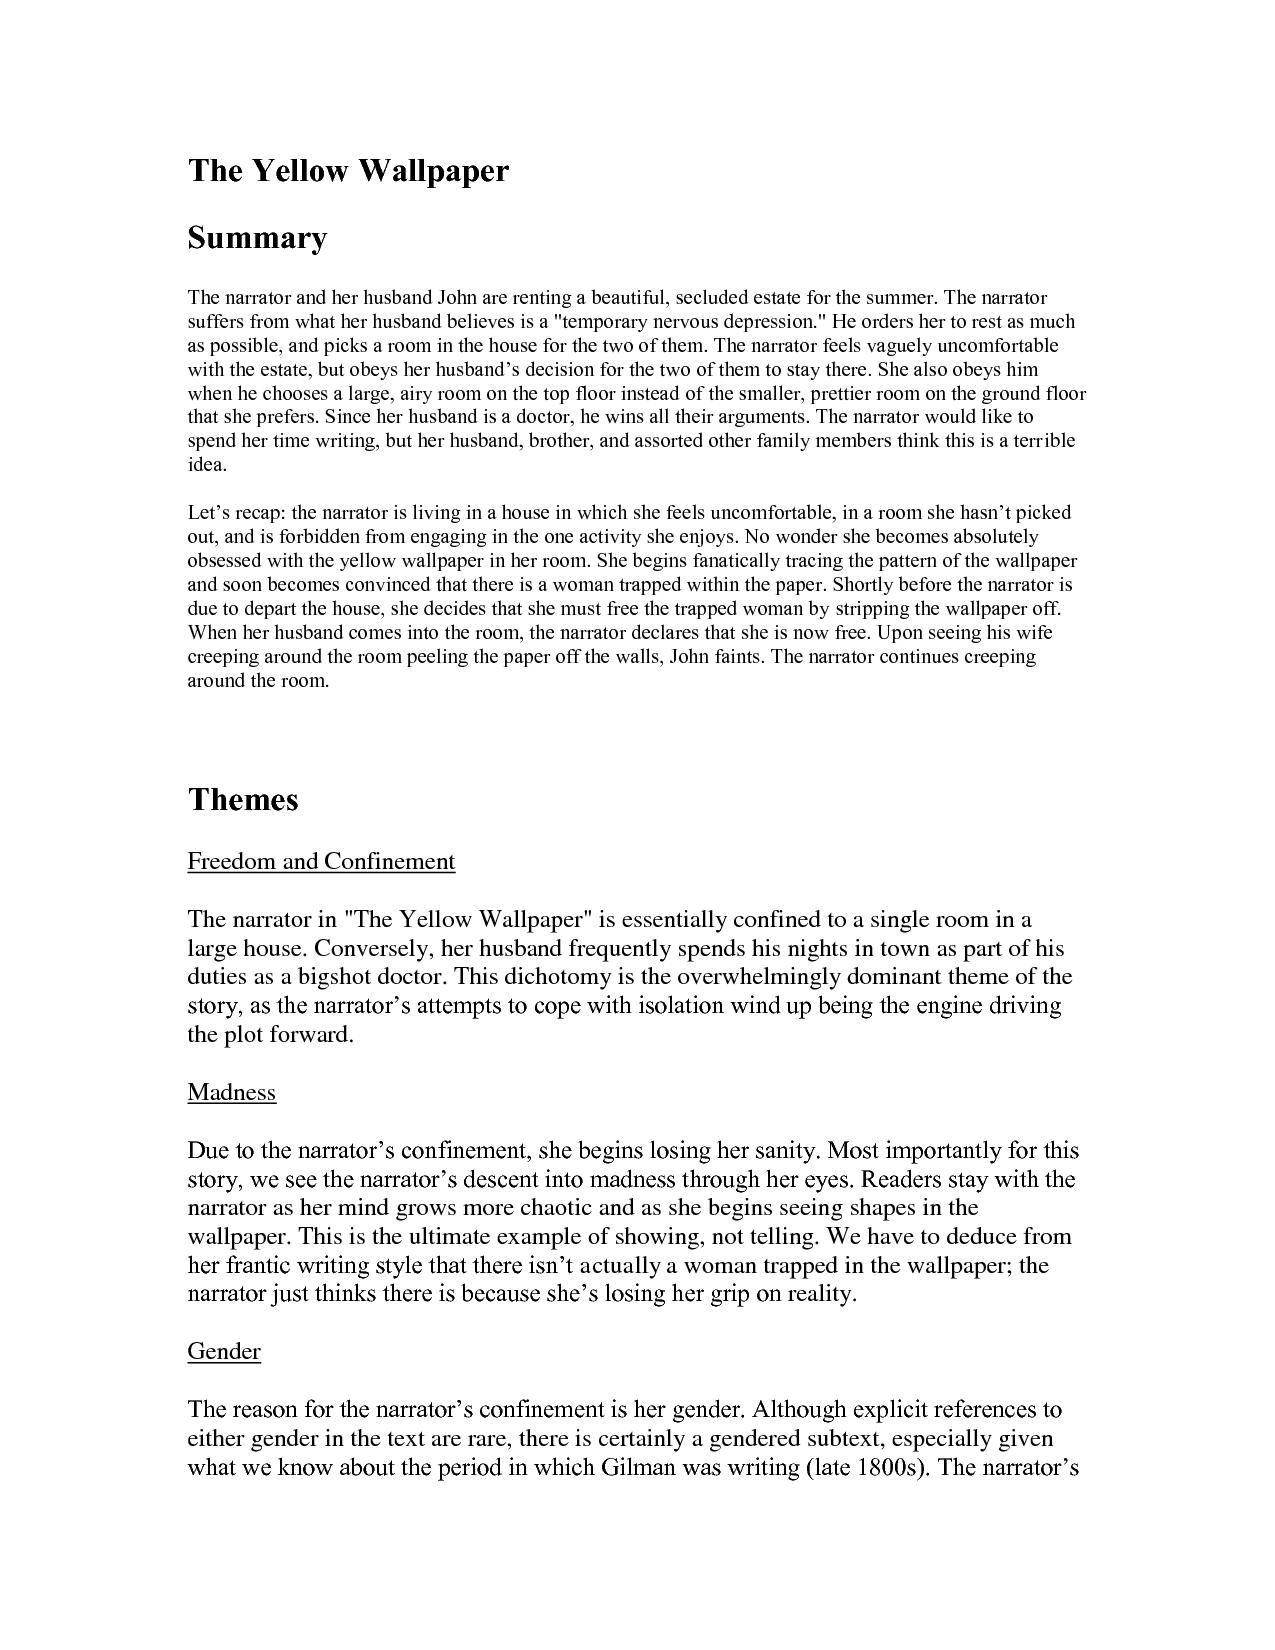 96272918 Yellow wallpaper character analysis essay uncategorized 1275x1650